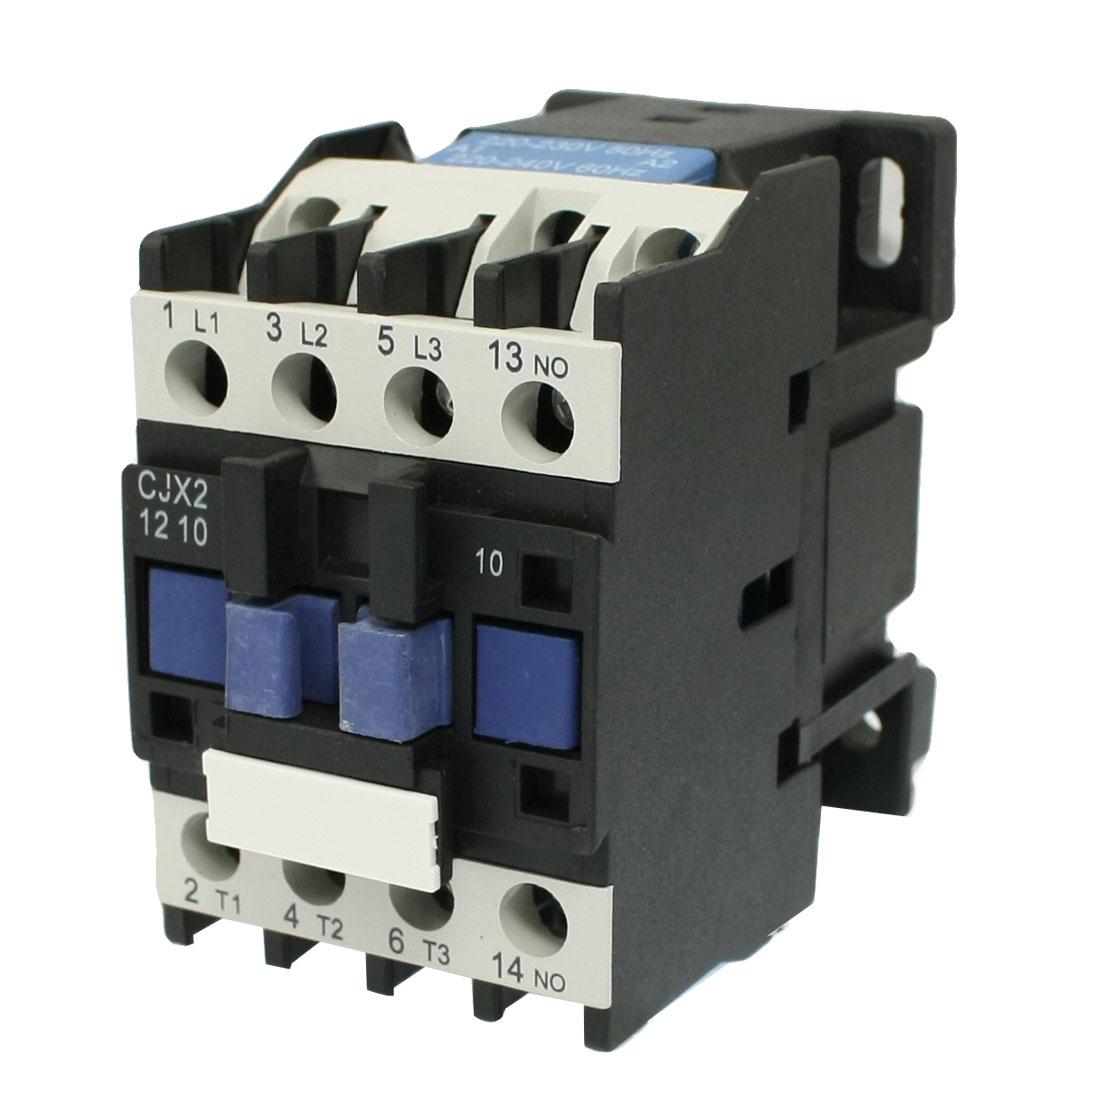 CJX2-1210 690V Ui 12A 220 Volt 3 Poles AC Contactor 220-240V 60HZ Coil